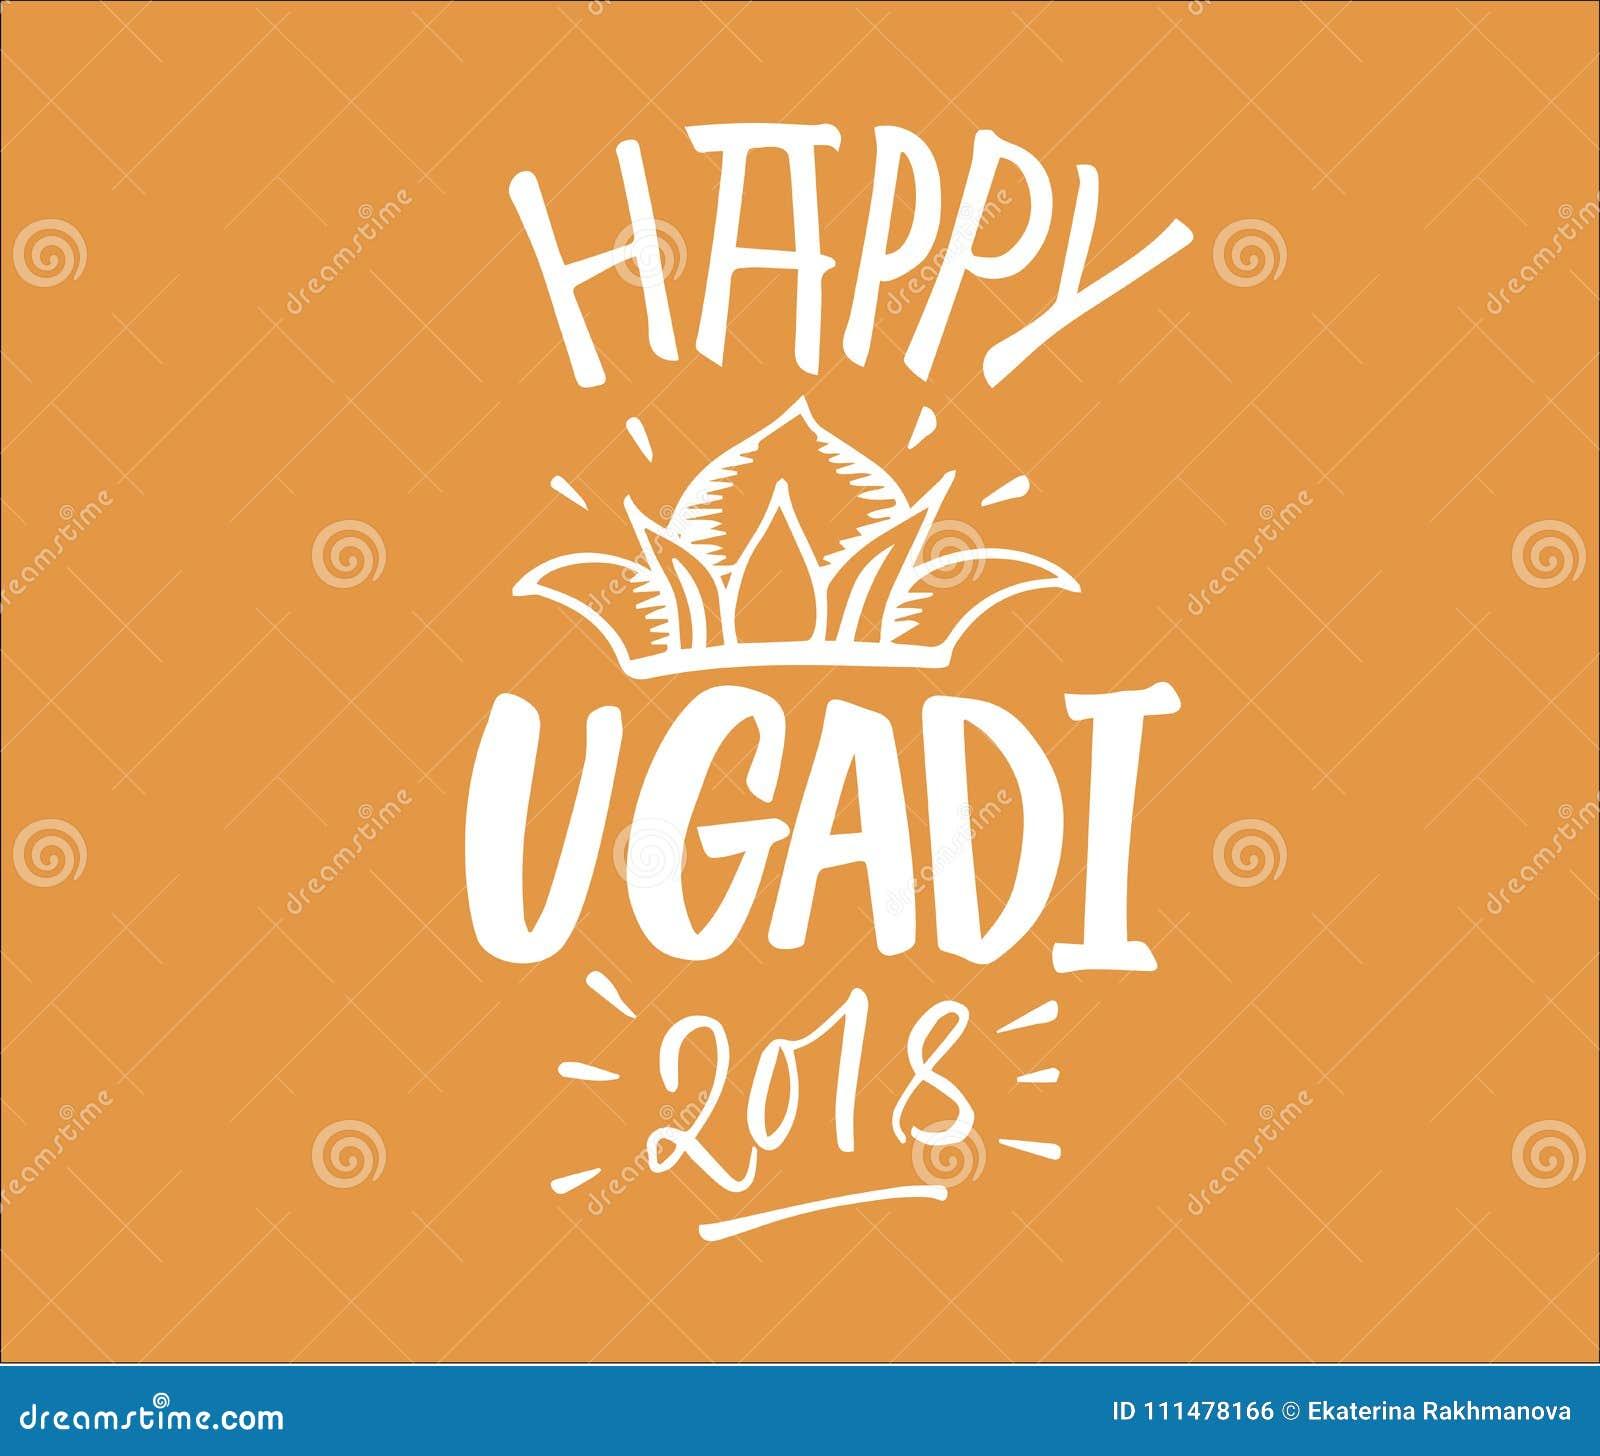 Happy New Year Hindu 3